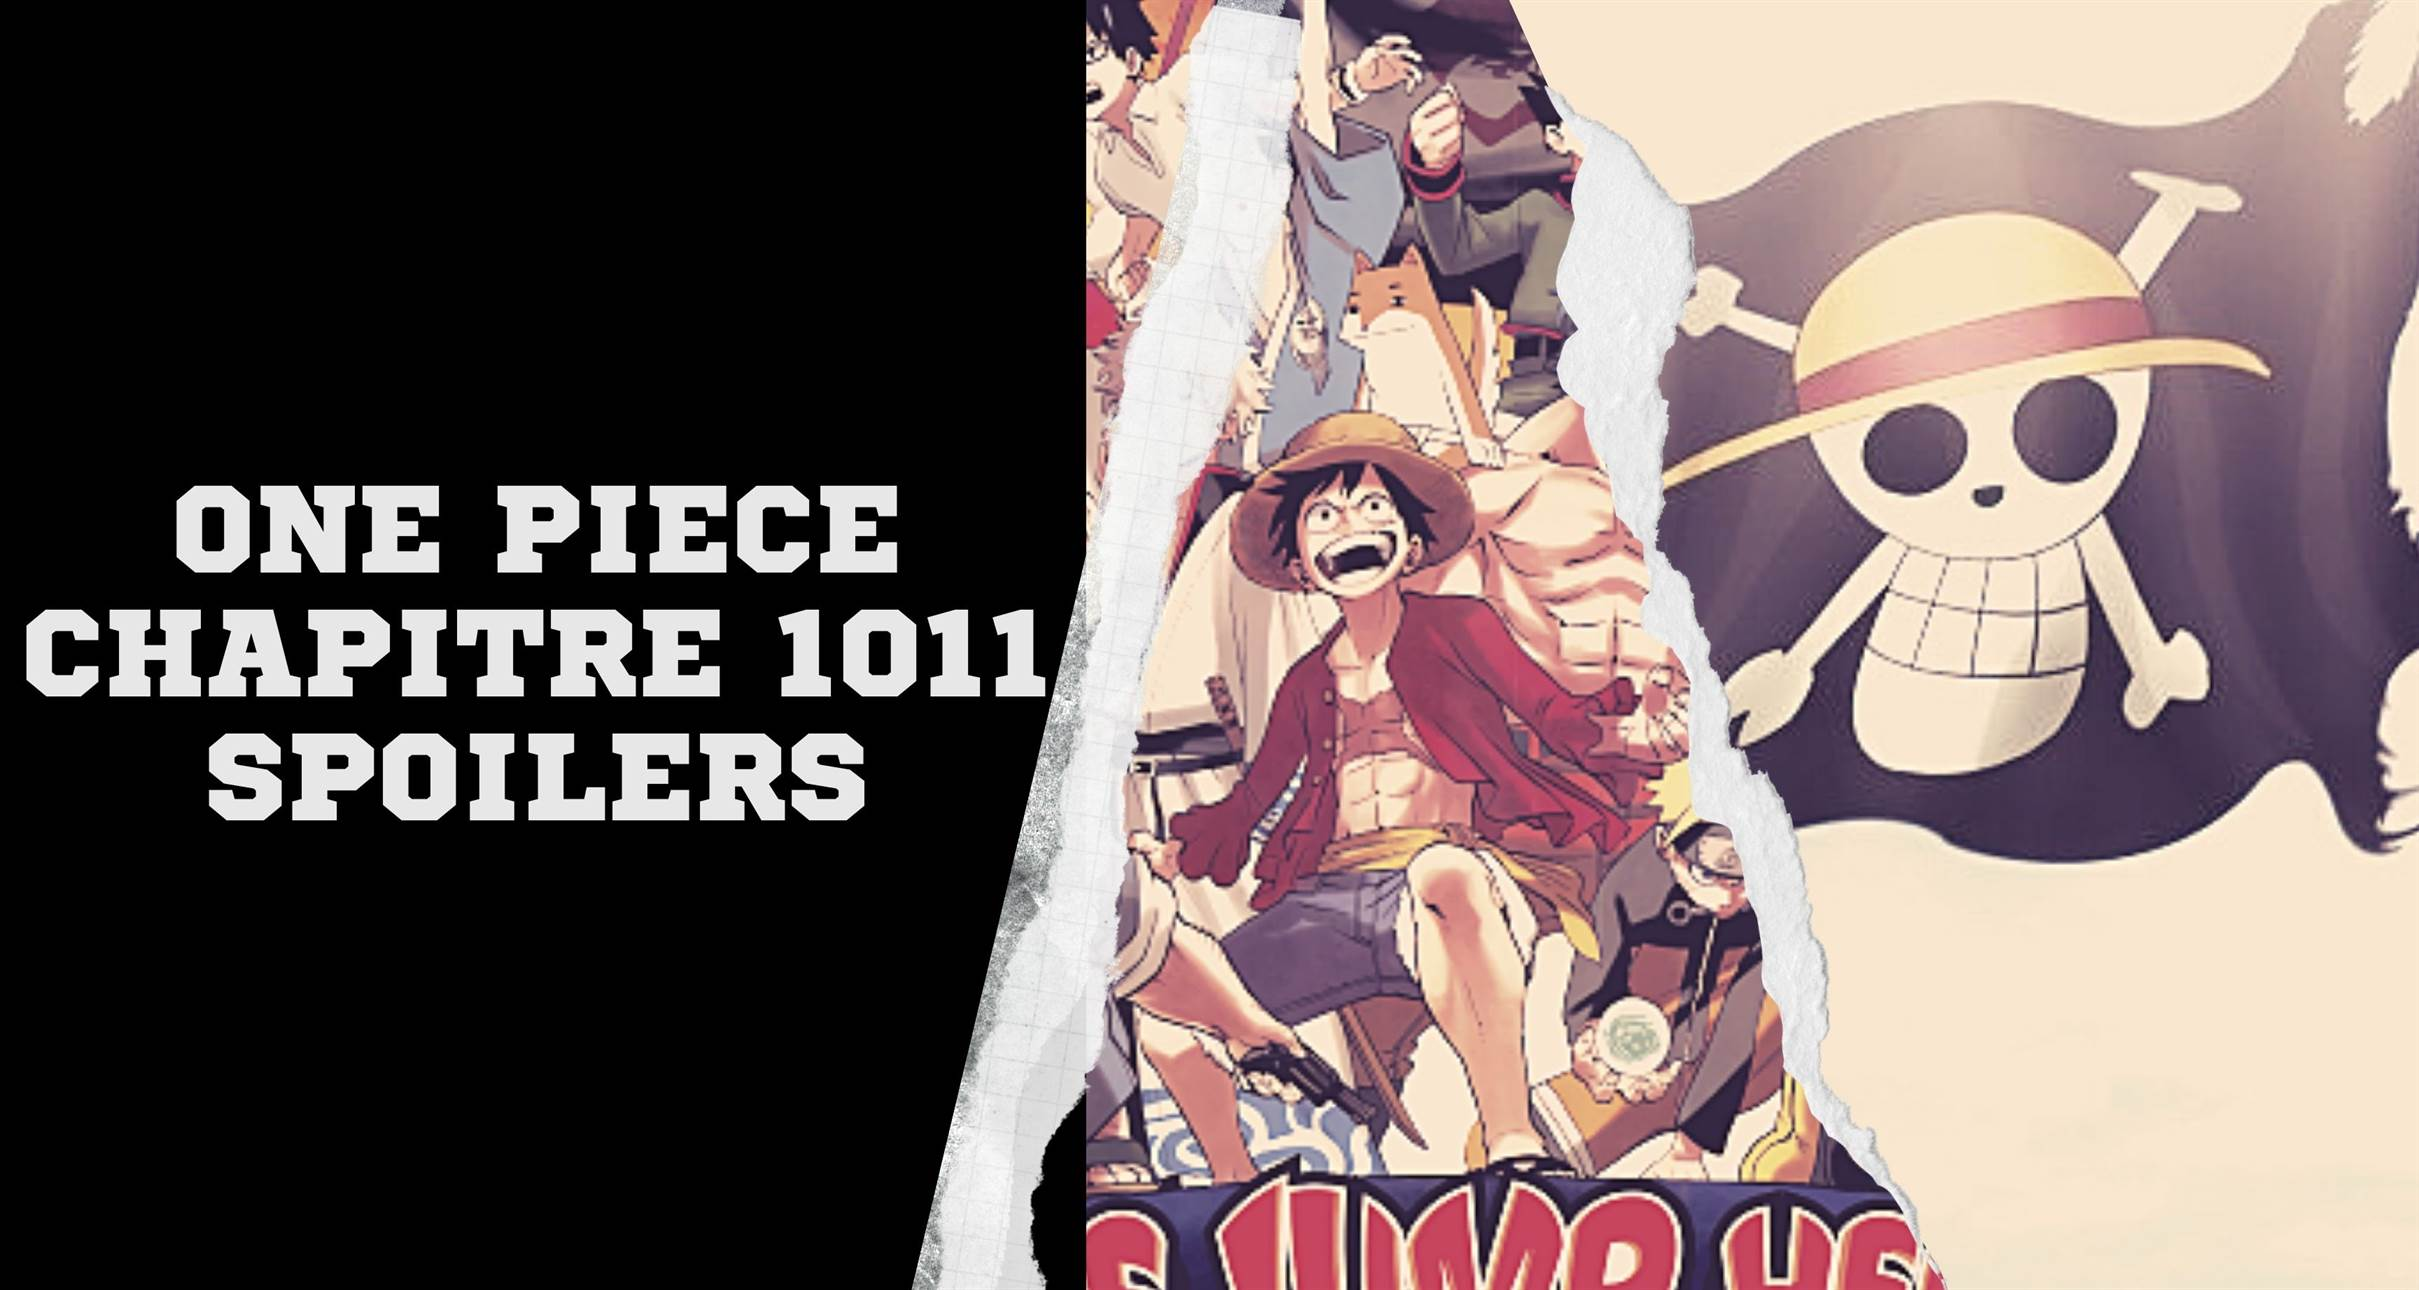 One Piece Chapitre 1011 Spoilers